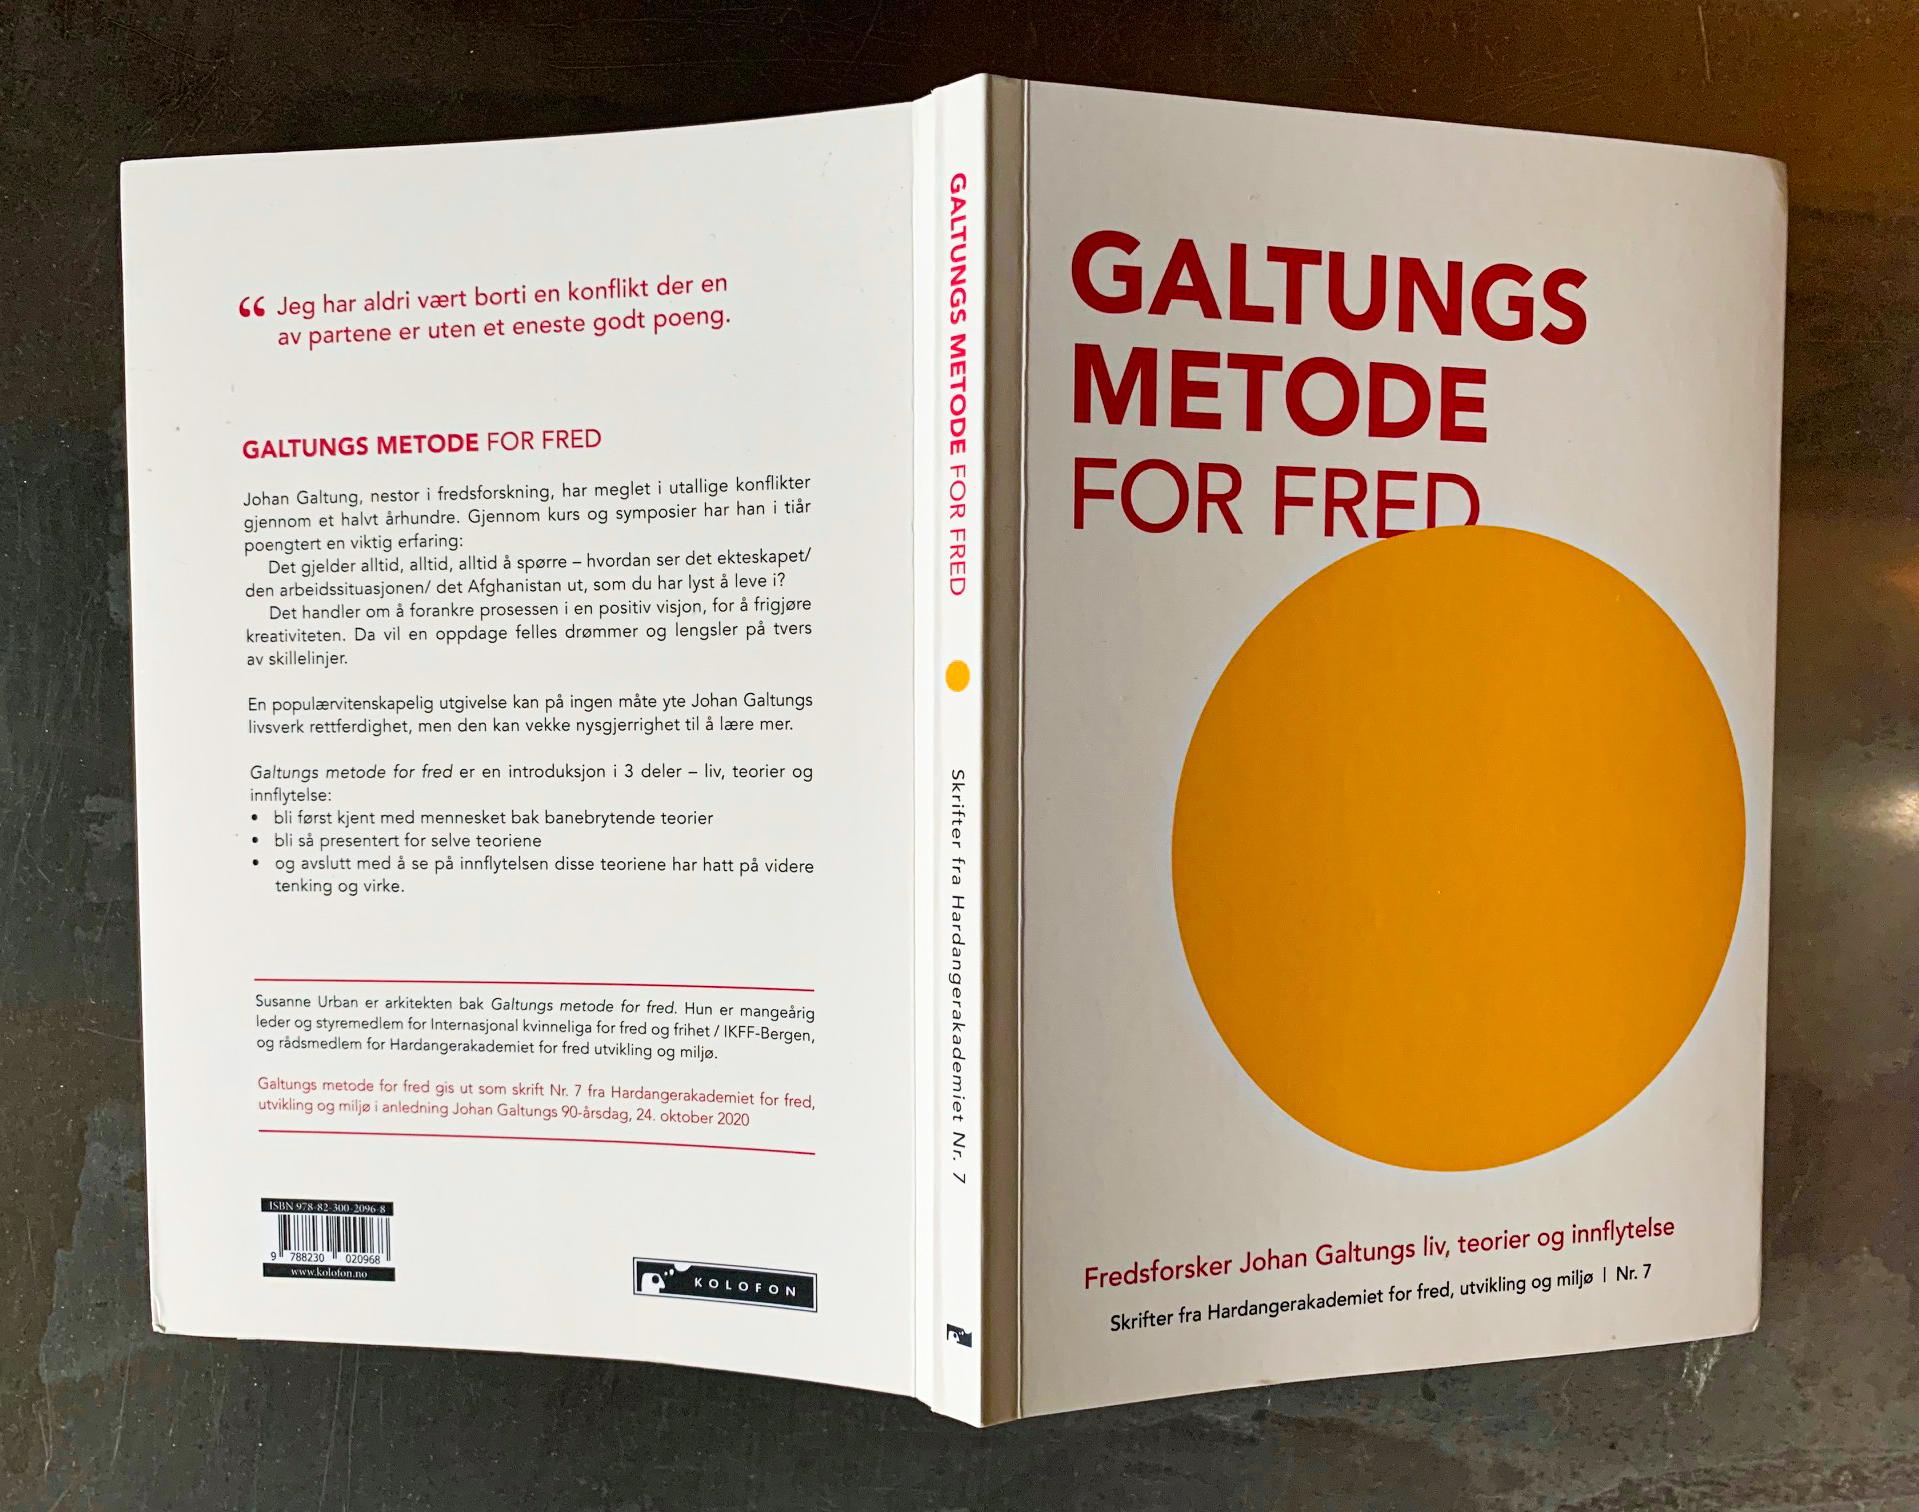 Ny bog om Johan Galtung til 90 års dagen